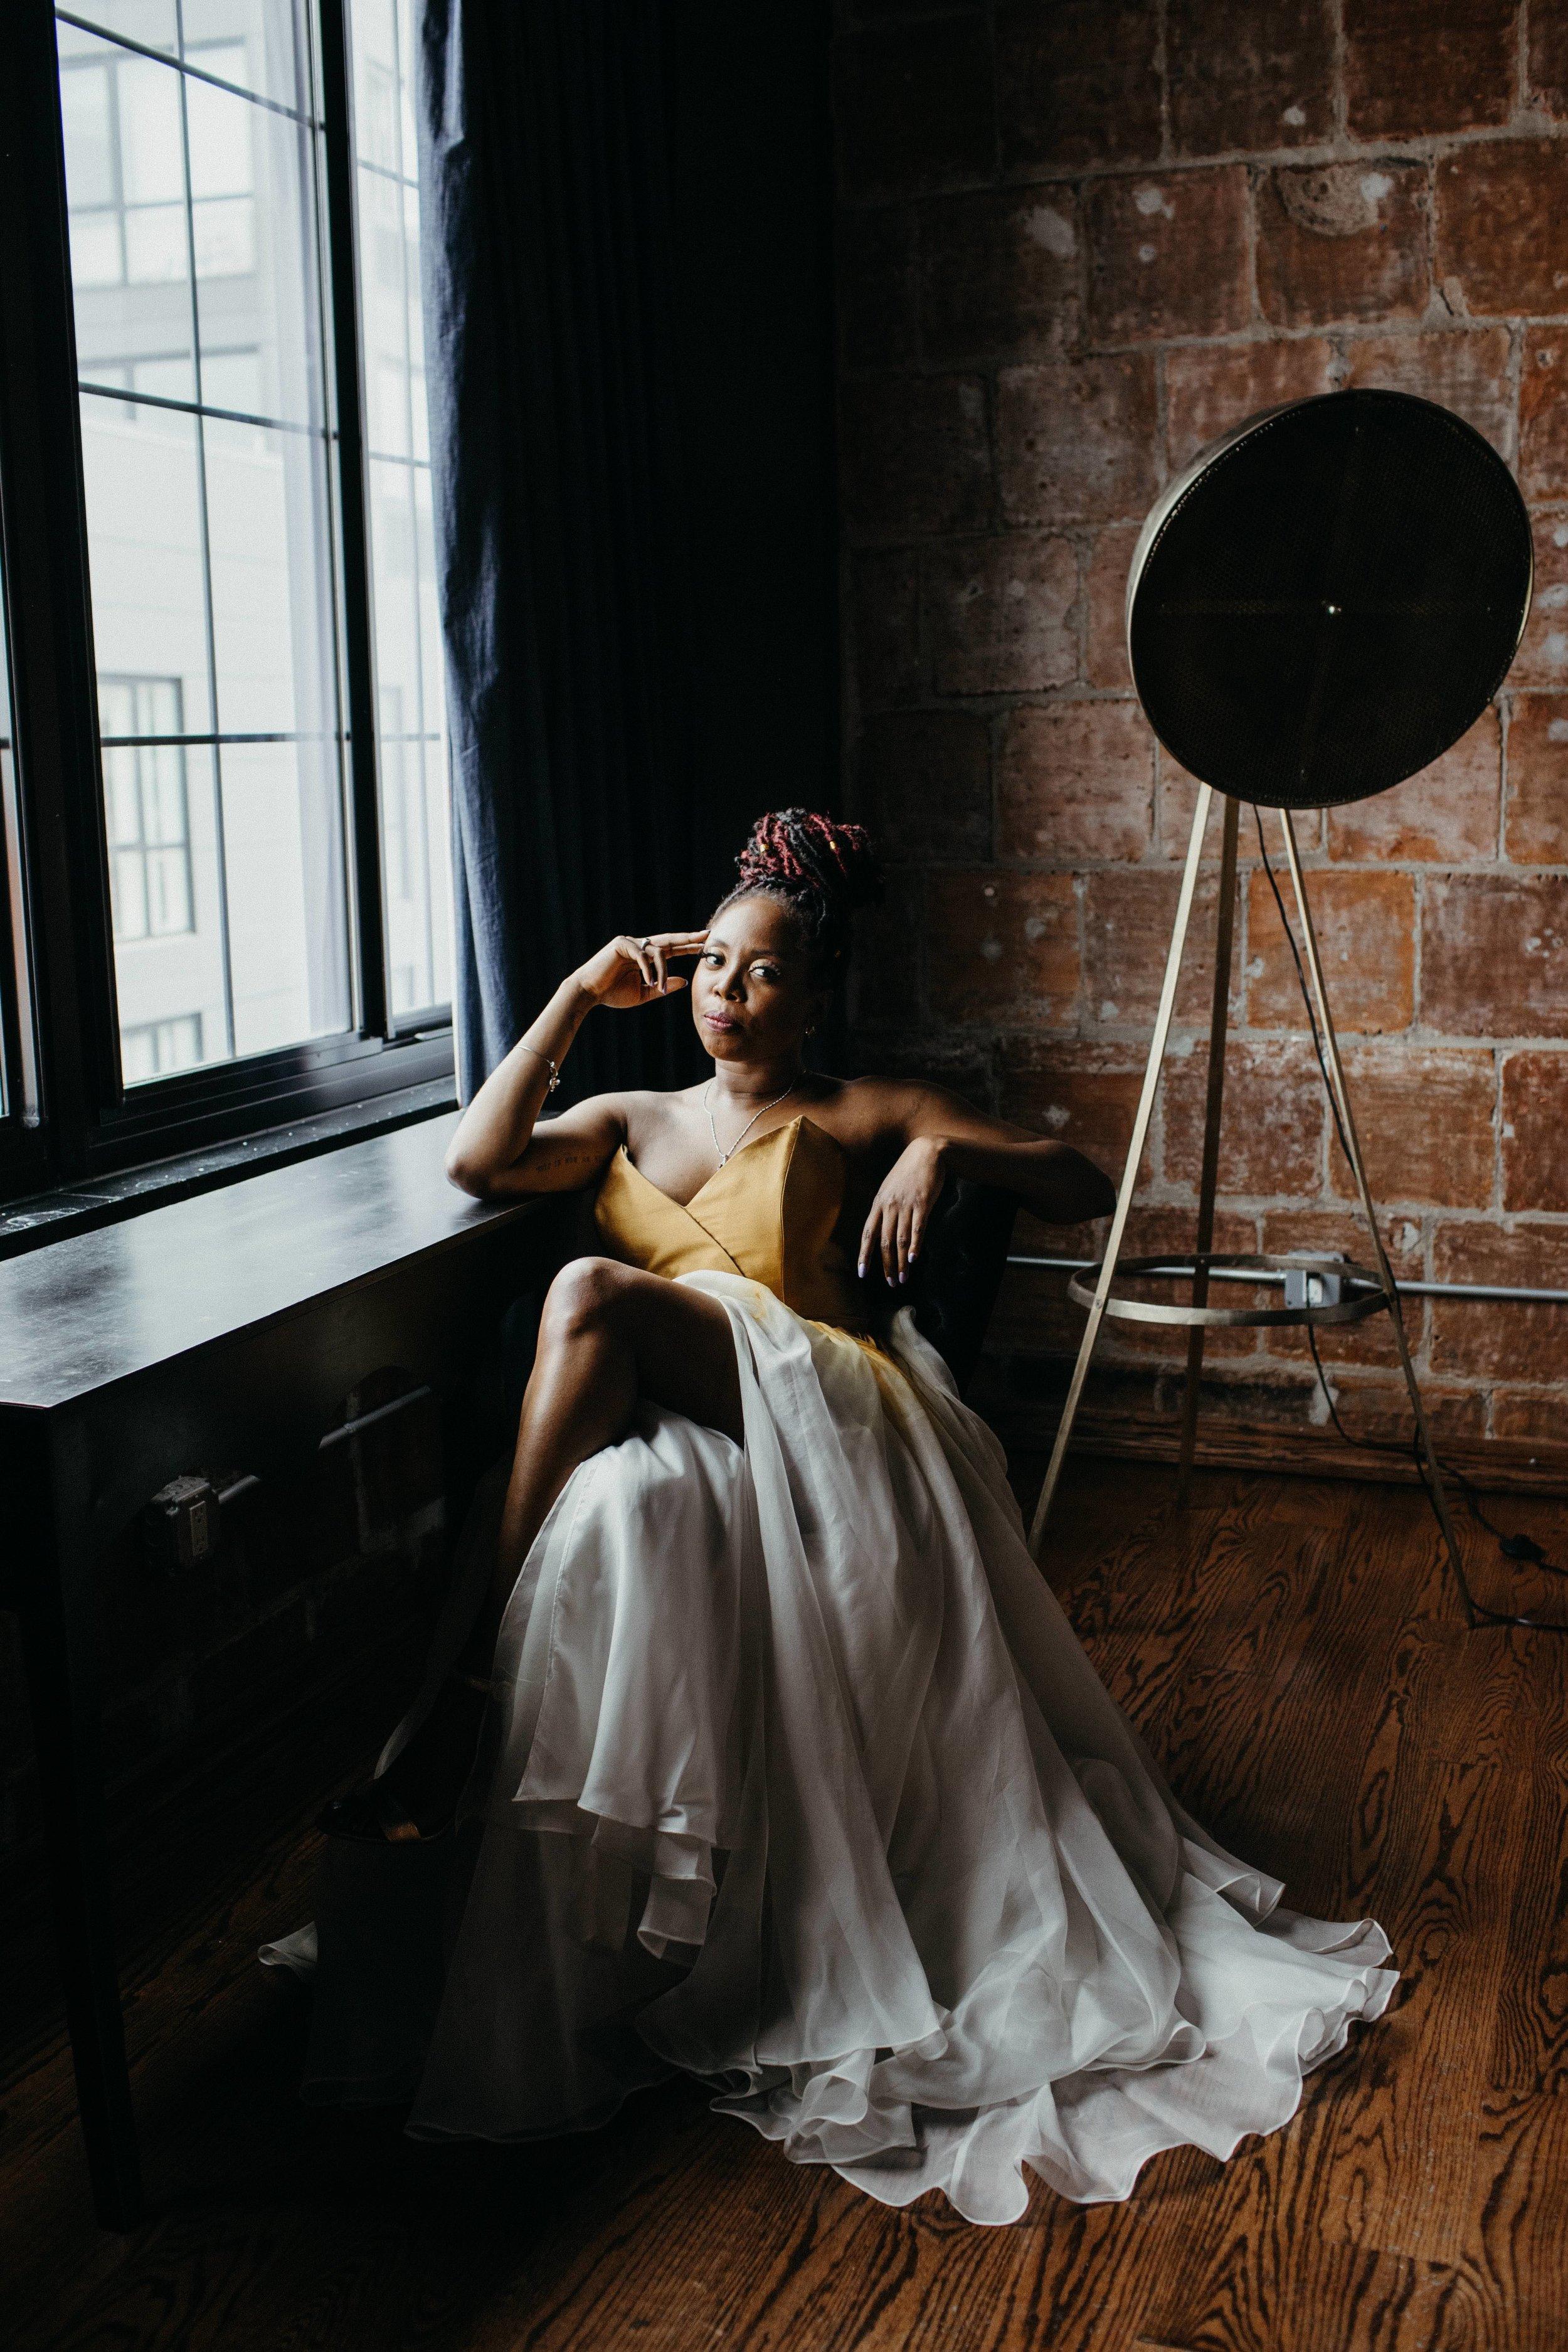 Sevlynn-Photography-Wedding-LIC-Landing-Maiella-NYC-30.jpg